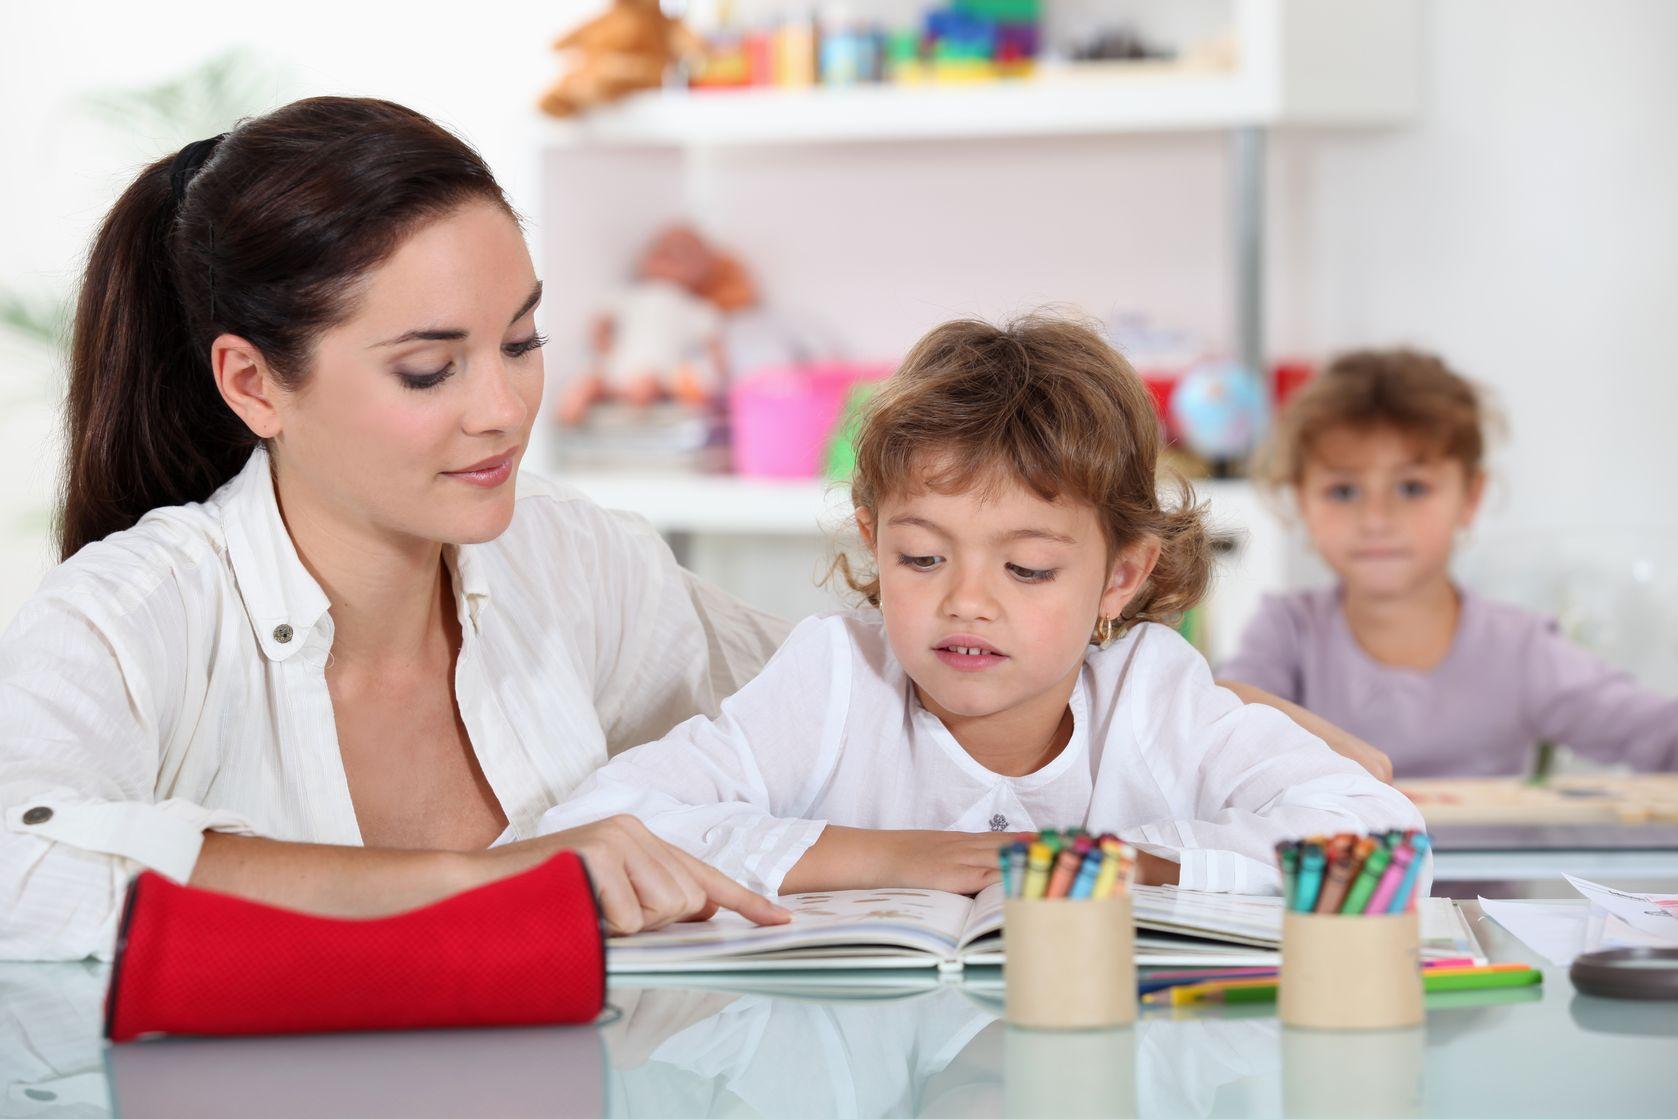 Child Care Responsibilities Resume Template Child Care